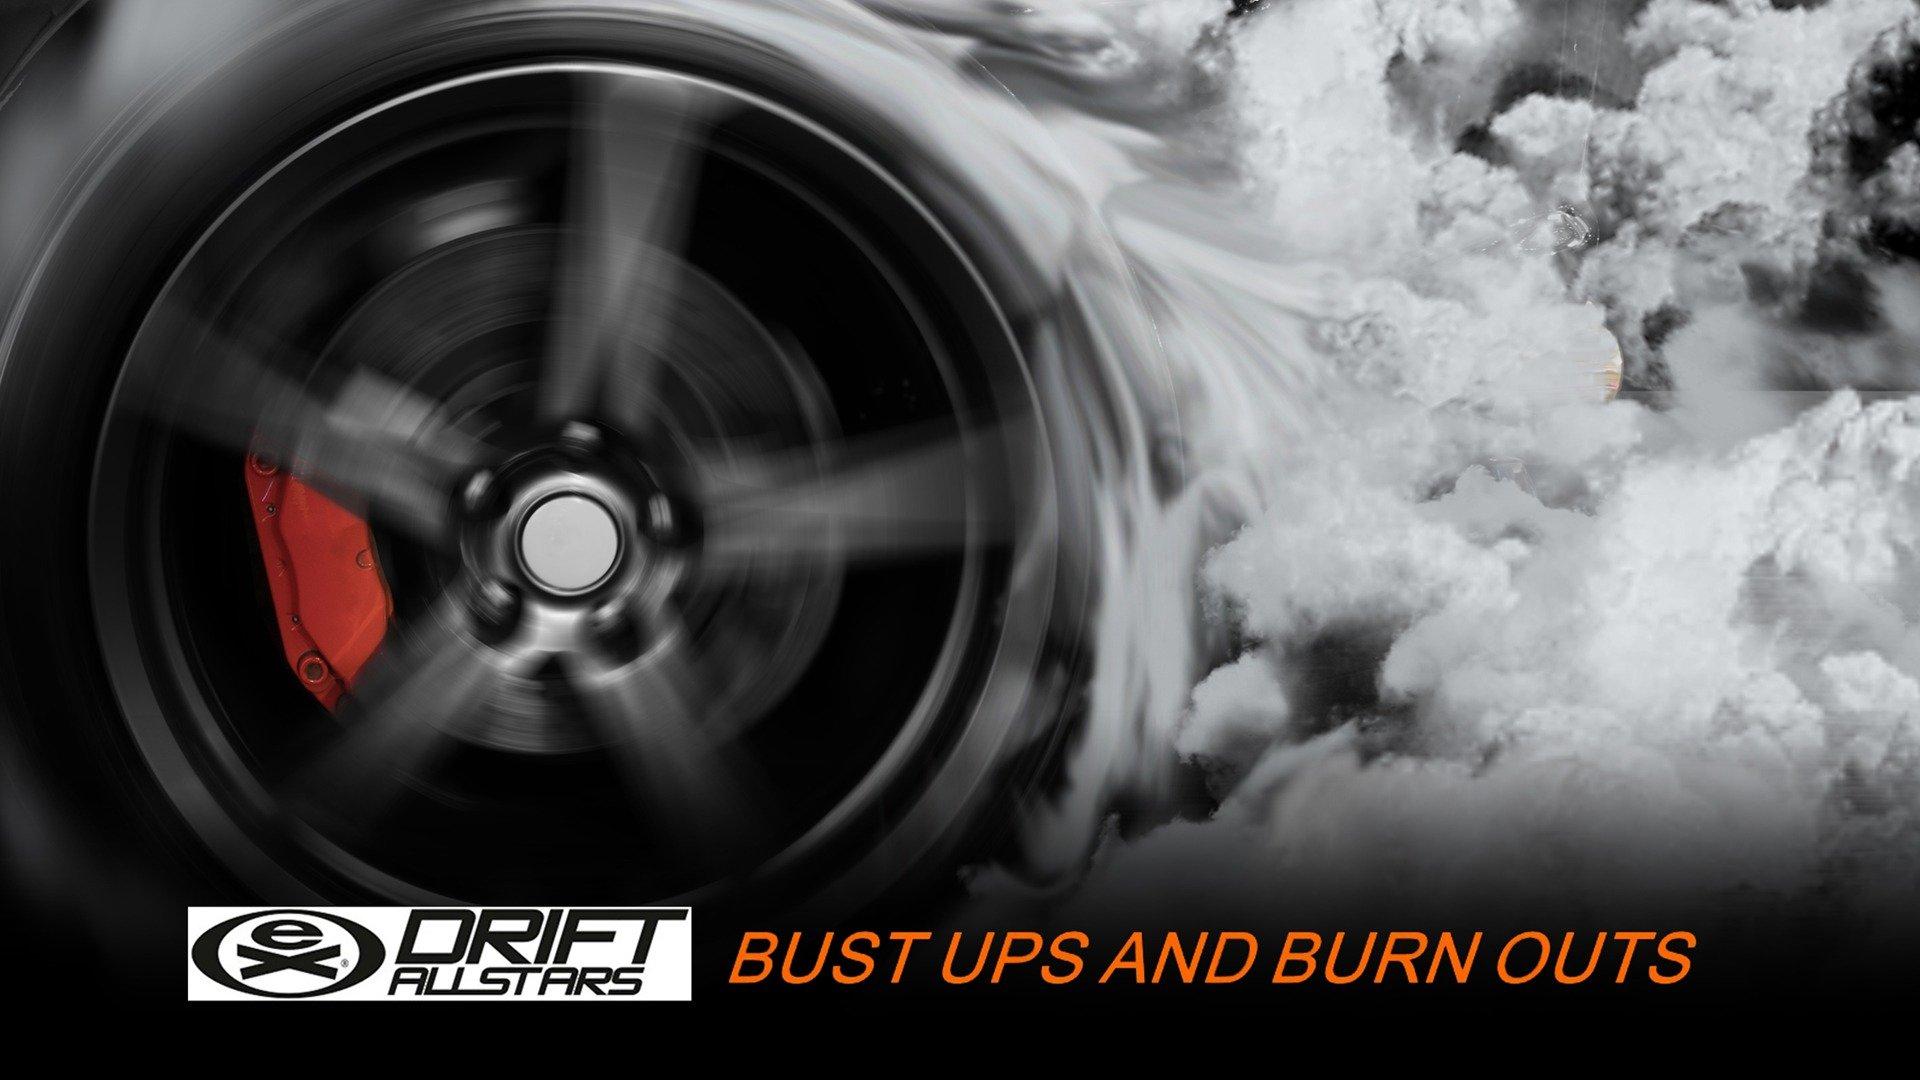 Drift Allstars: Burnouts and Bust Ups